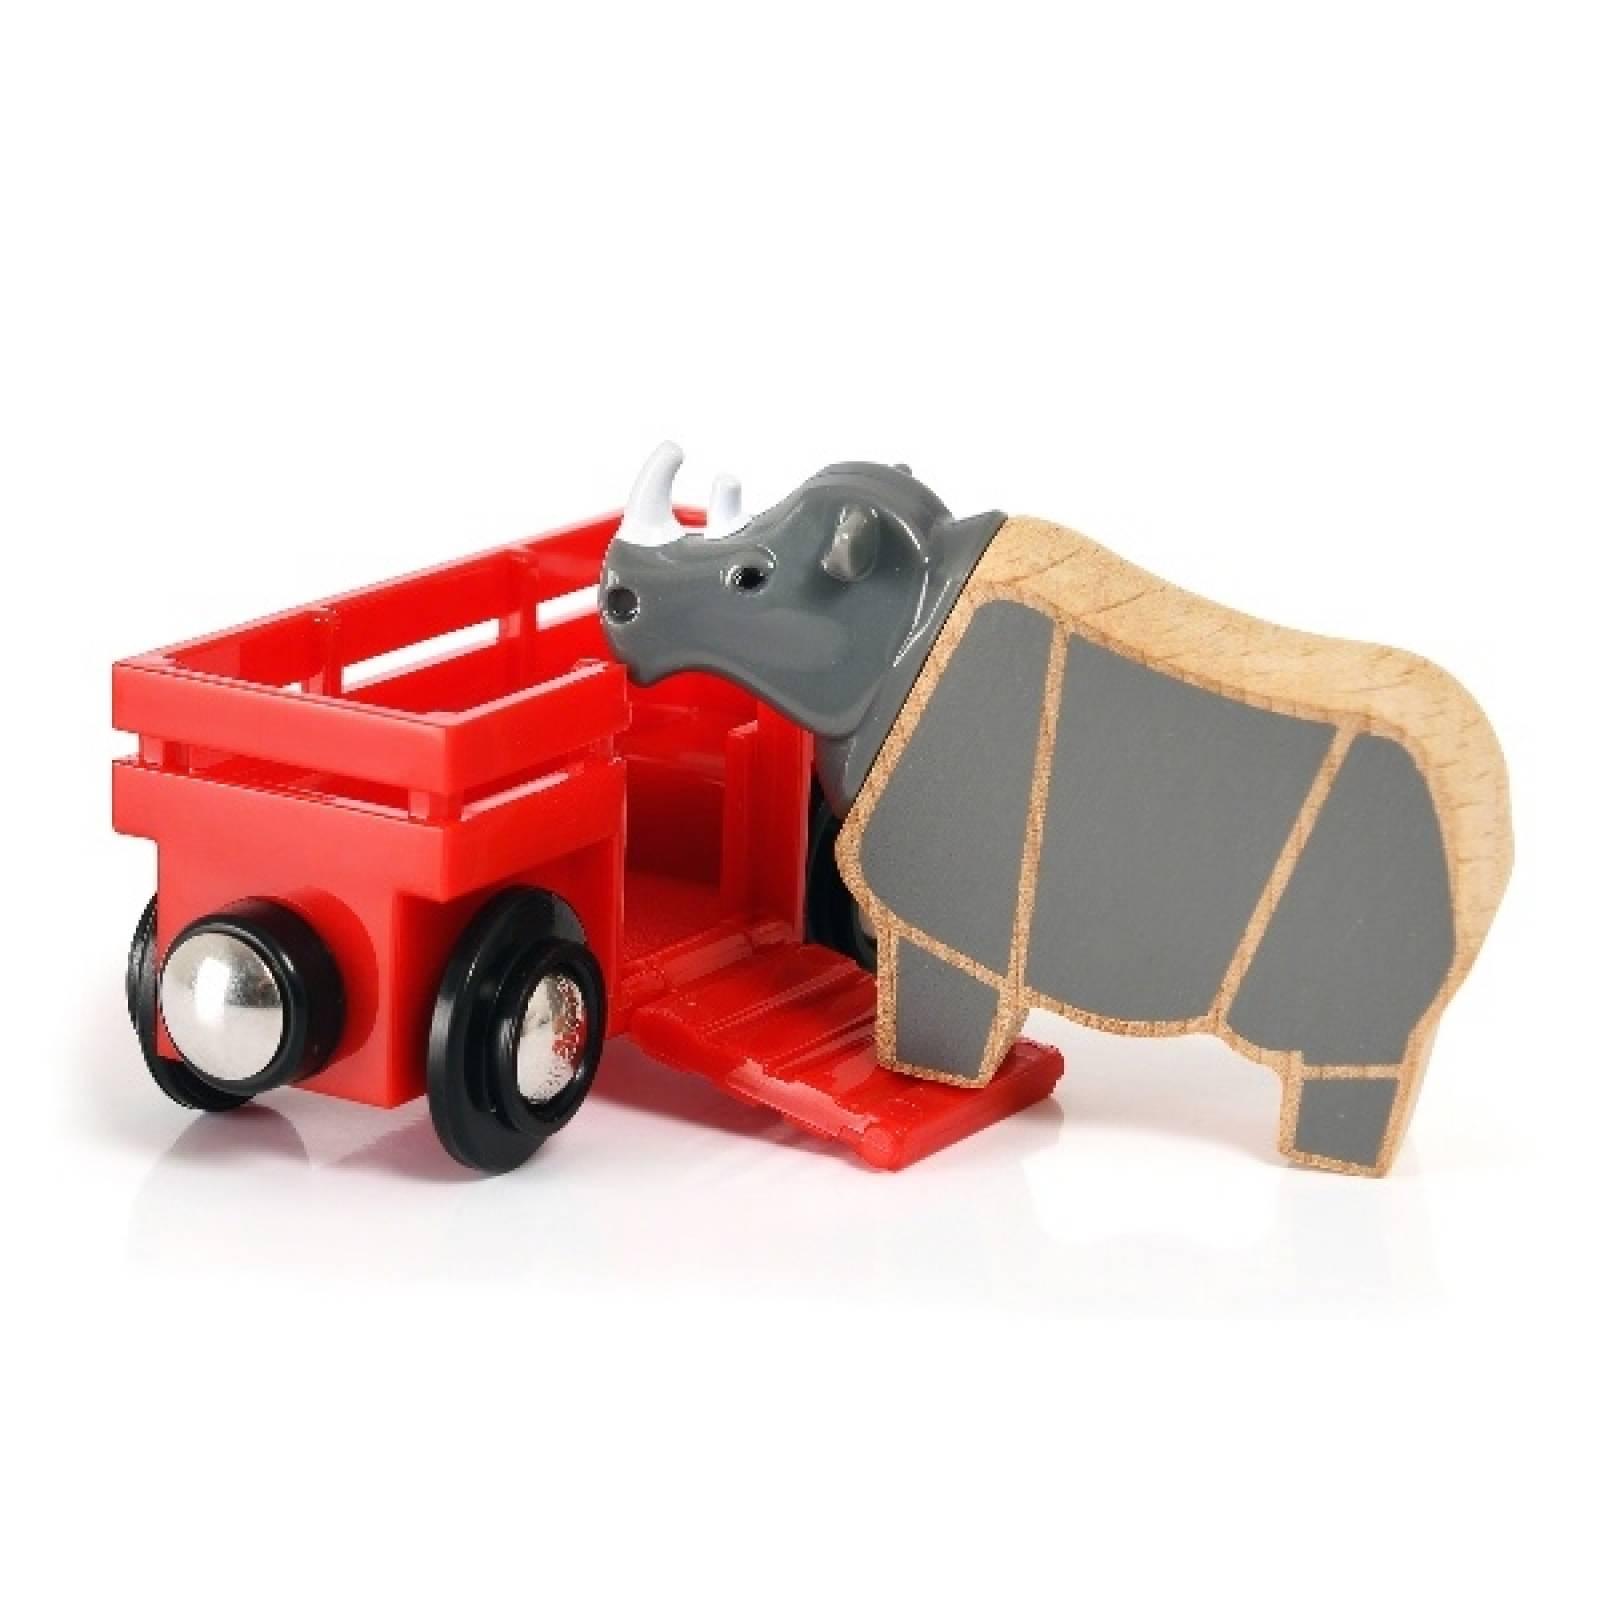 Rhino & Wagon BRIO Wooden Railway Age 3+ thumbnails